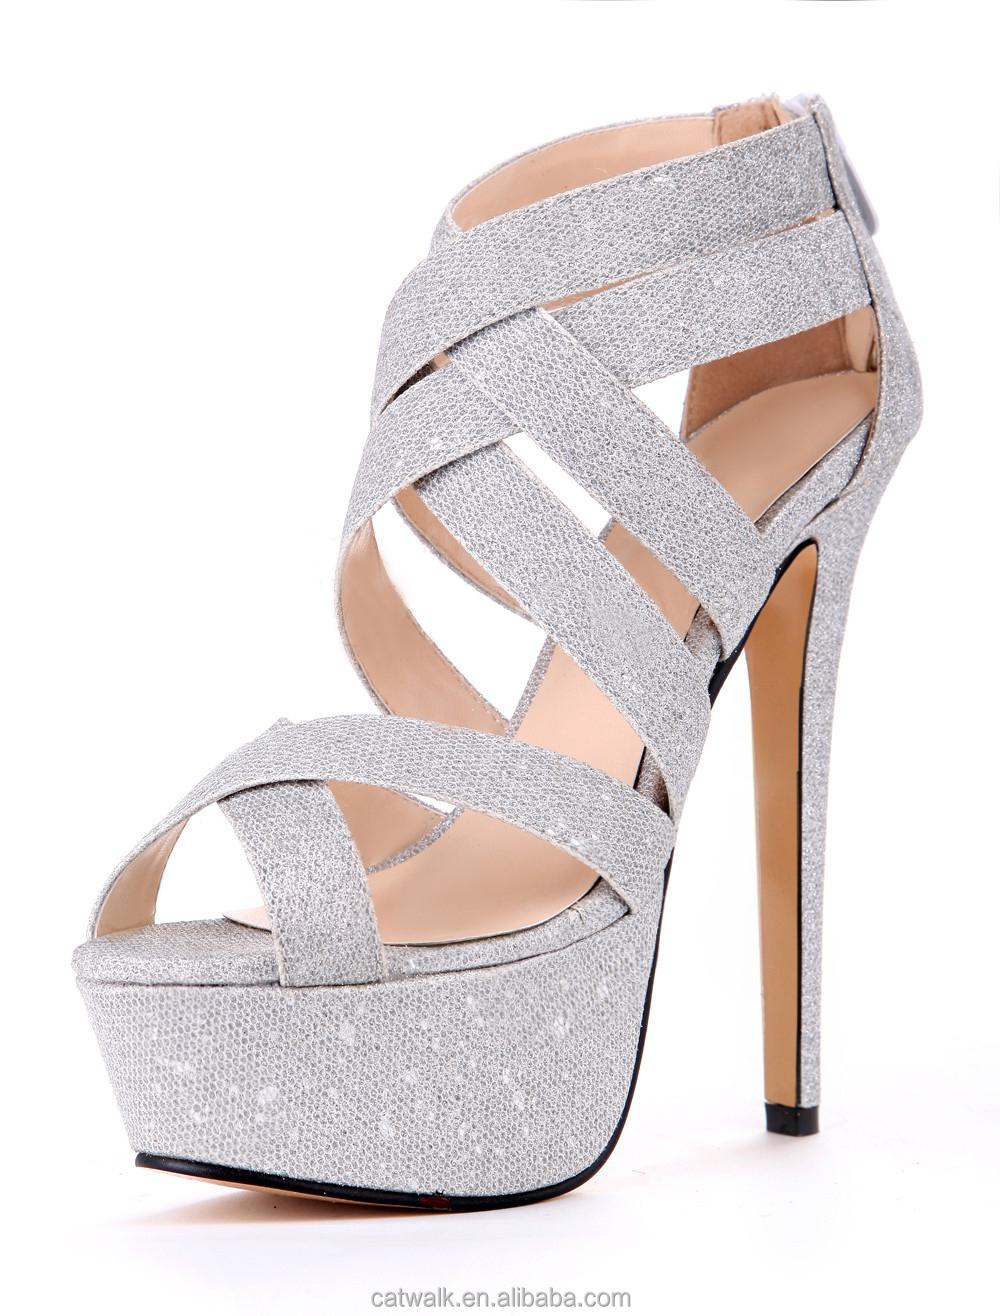 Sexy Silver Gitter Cloth Stiletto Heel Gladiator Sandals For Women ...